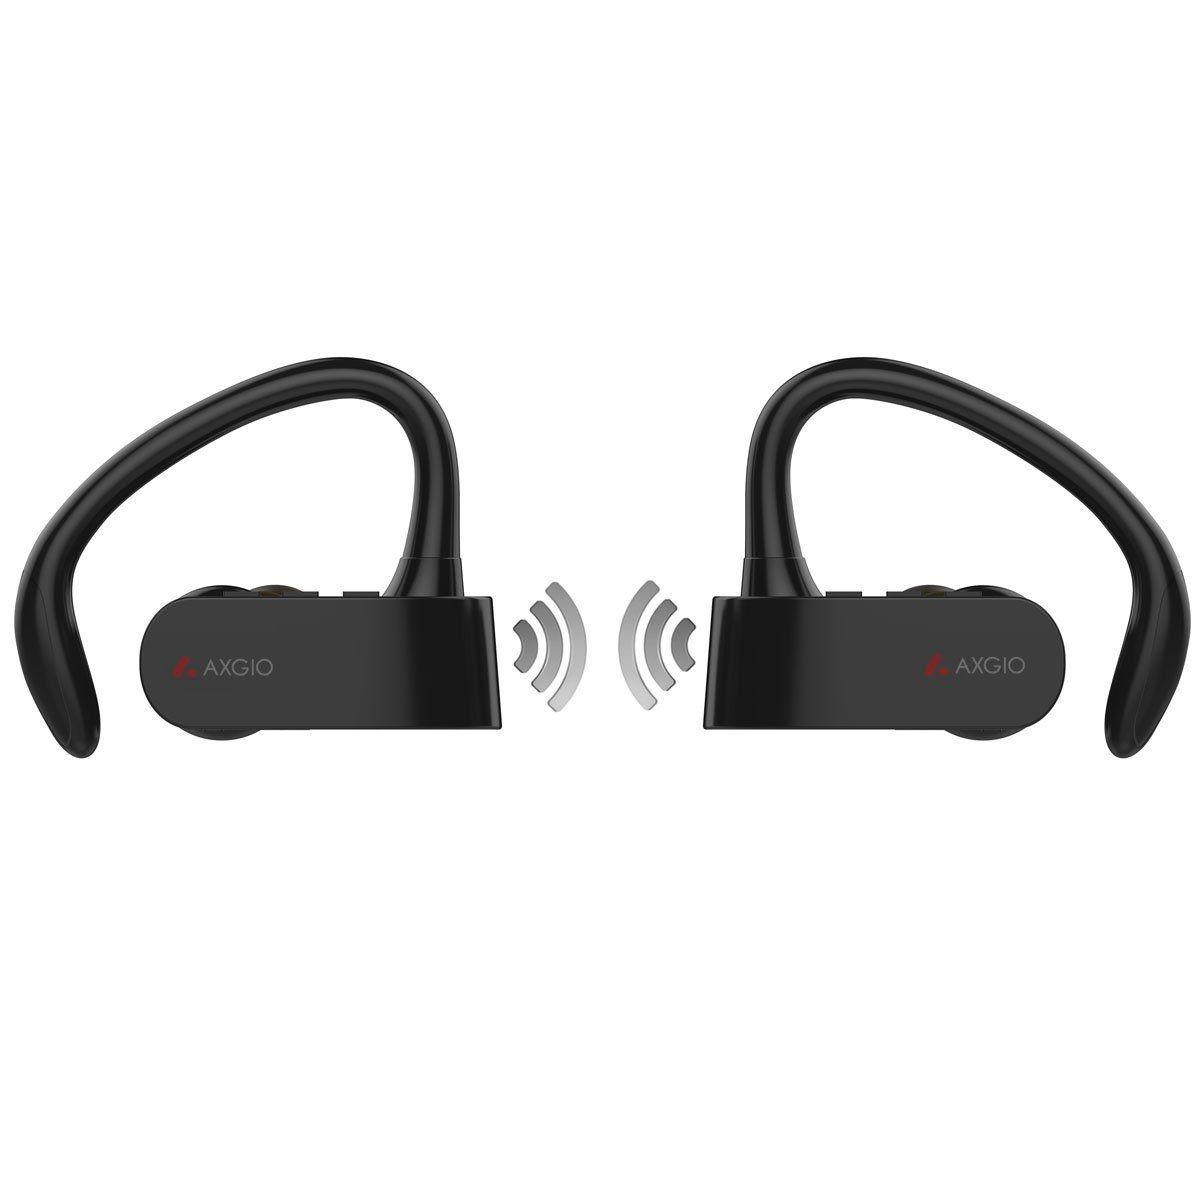 Amazon Com Axgio Wireless Earbuds Dash Cordless Running Jogging